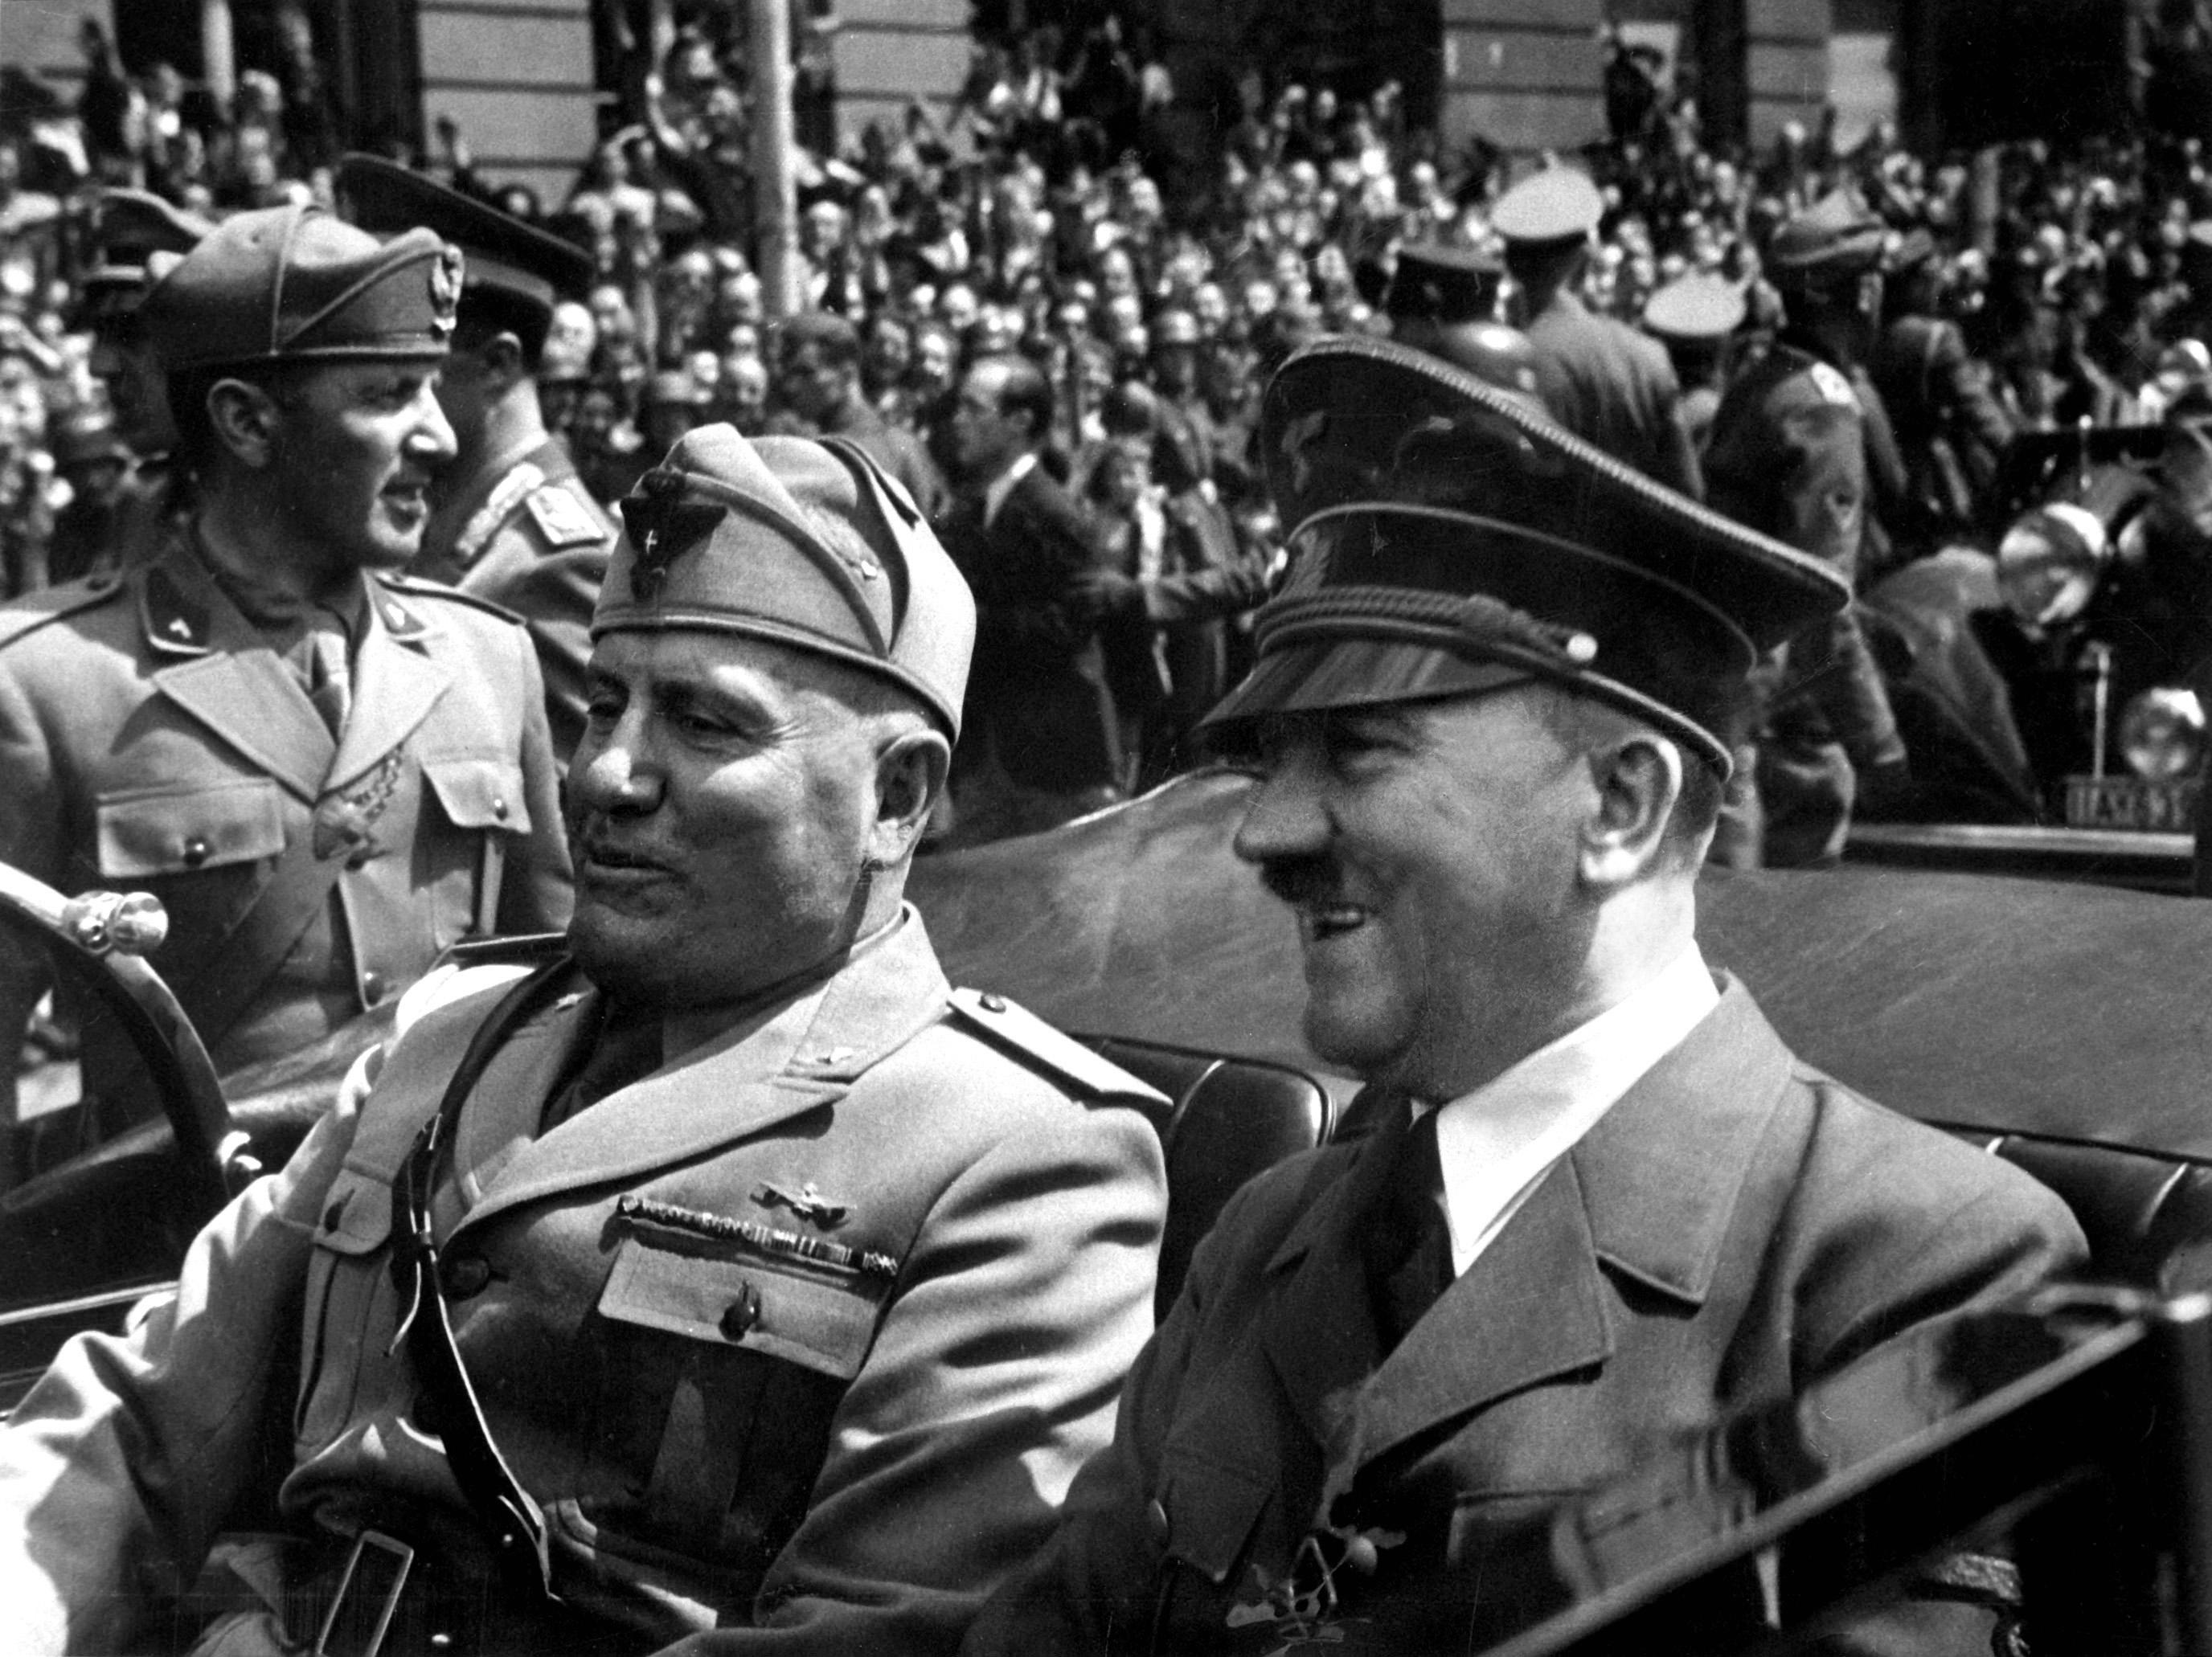 Mussoliniden 70 Yıl Sonra Italyada Faşizm Propagandası Suç